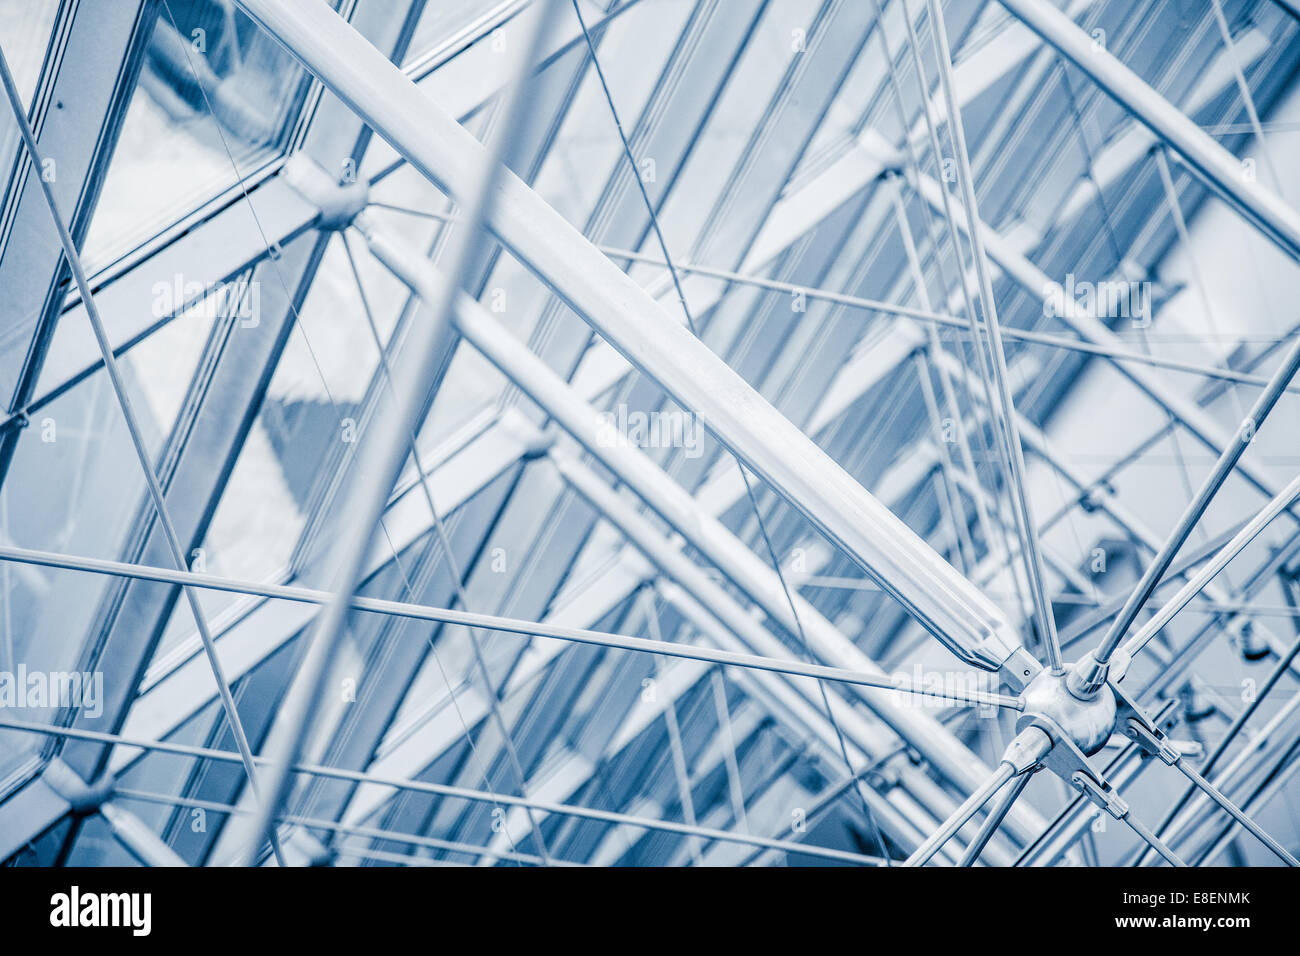 Curtainwall stock photos curtainwall stock images alamy for Architectural skylight